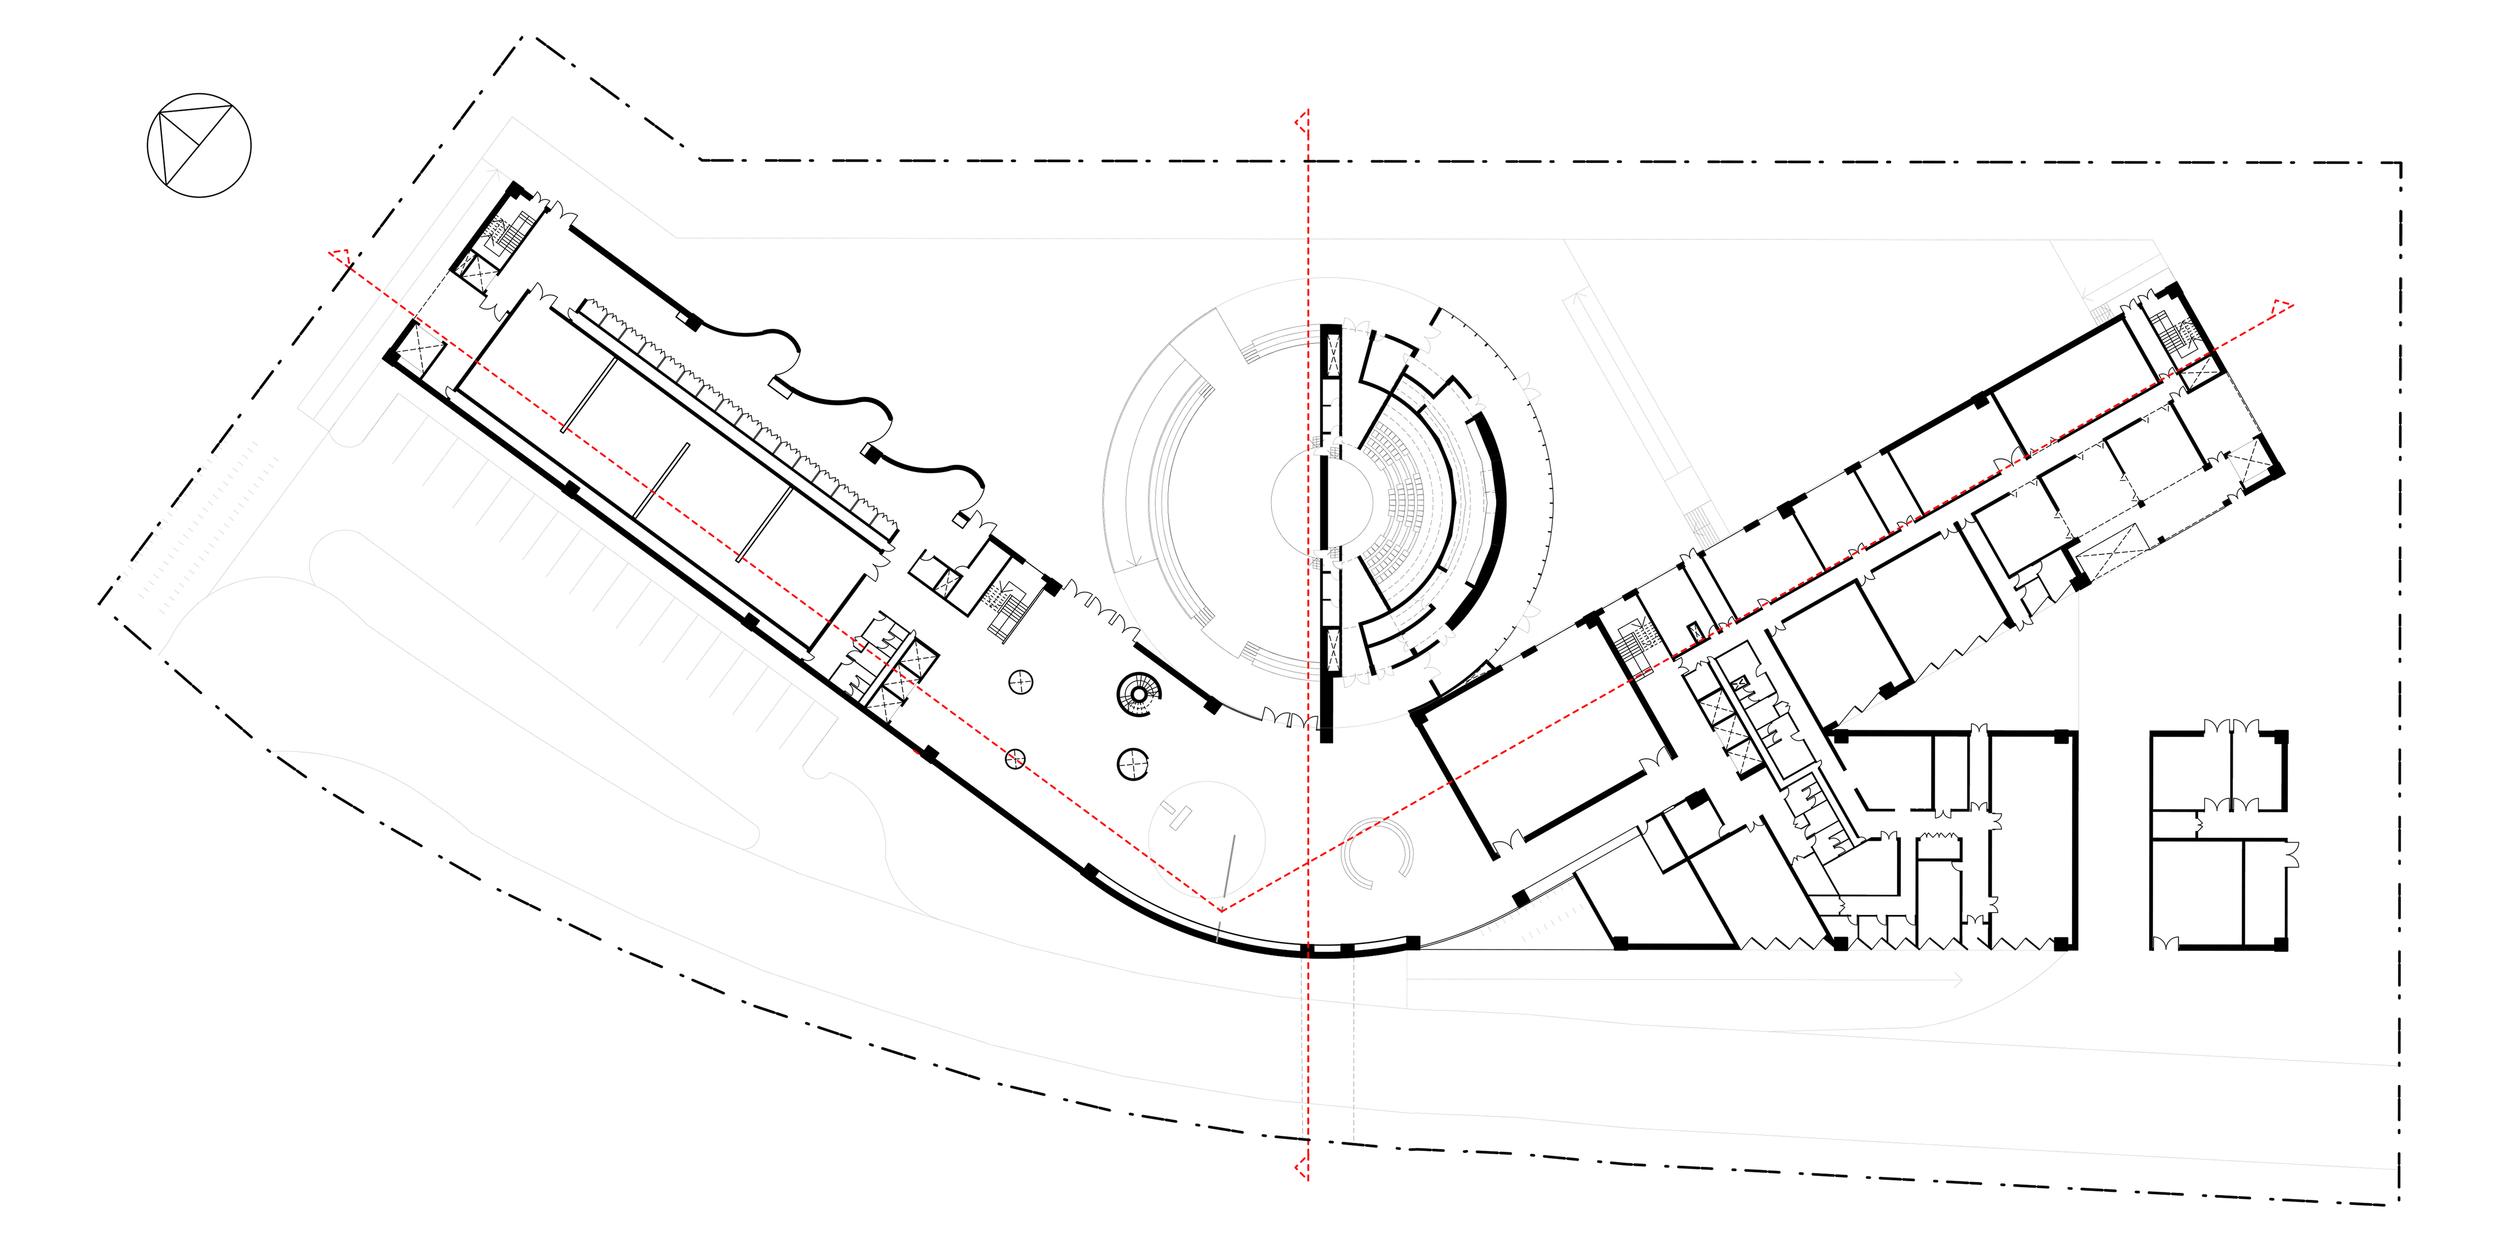 Guggenheim_Plan.jpg